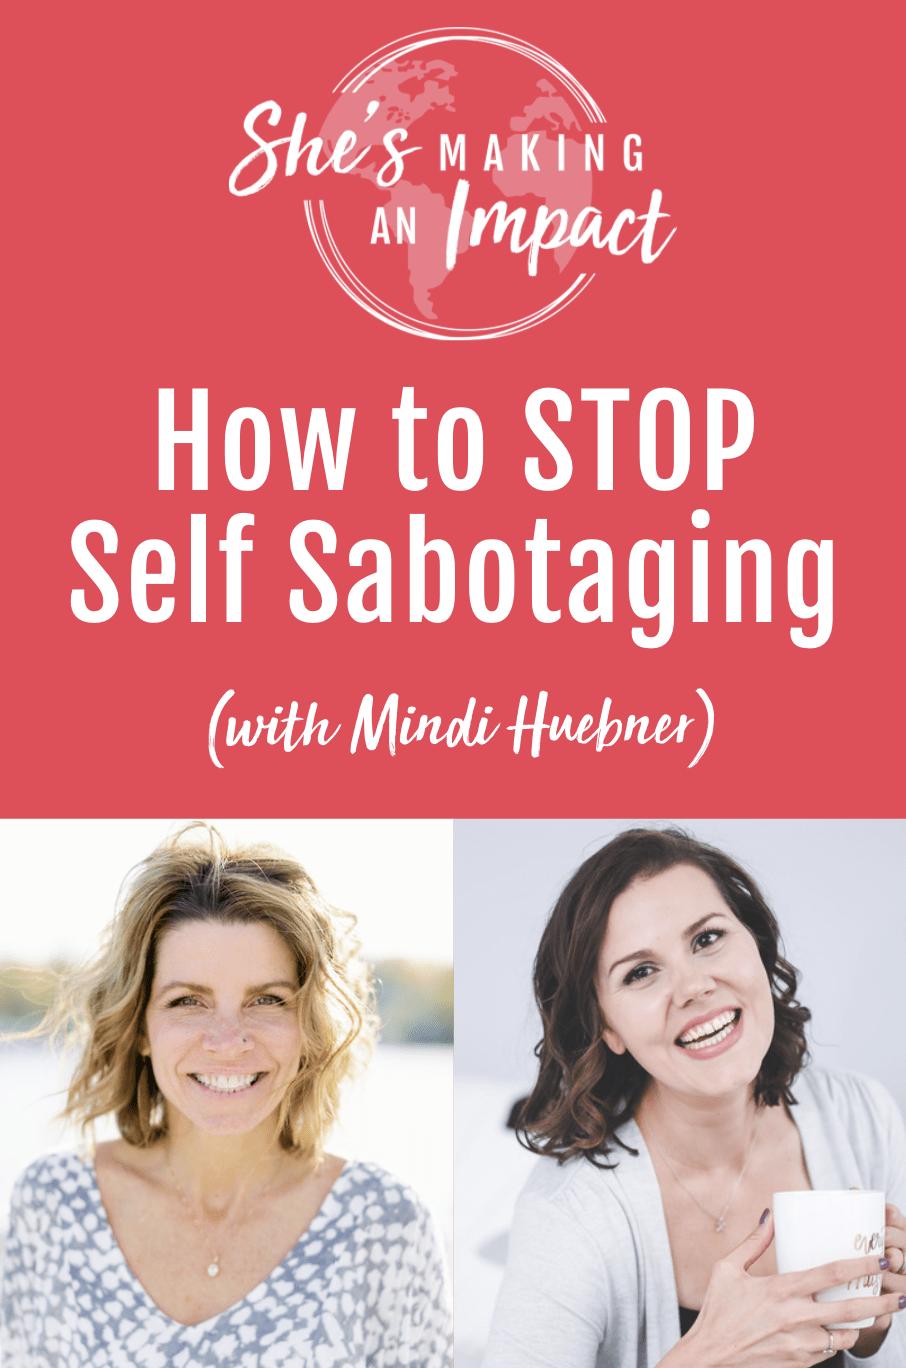 How to STOP Self Sabotaging (with Mindi Huebner): Episode 291